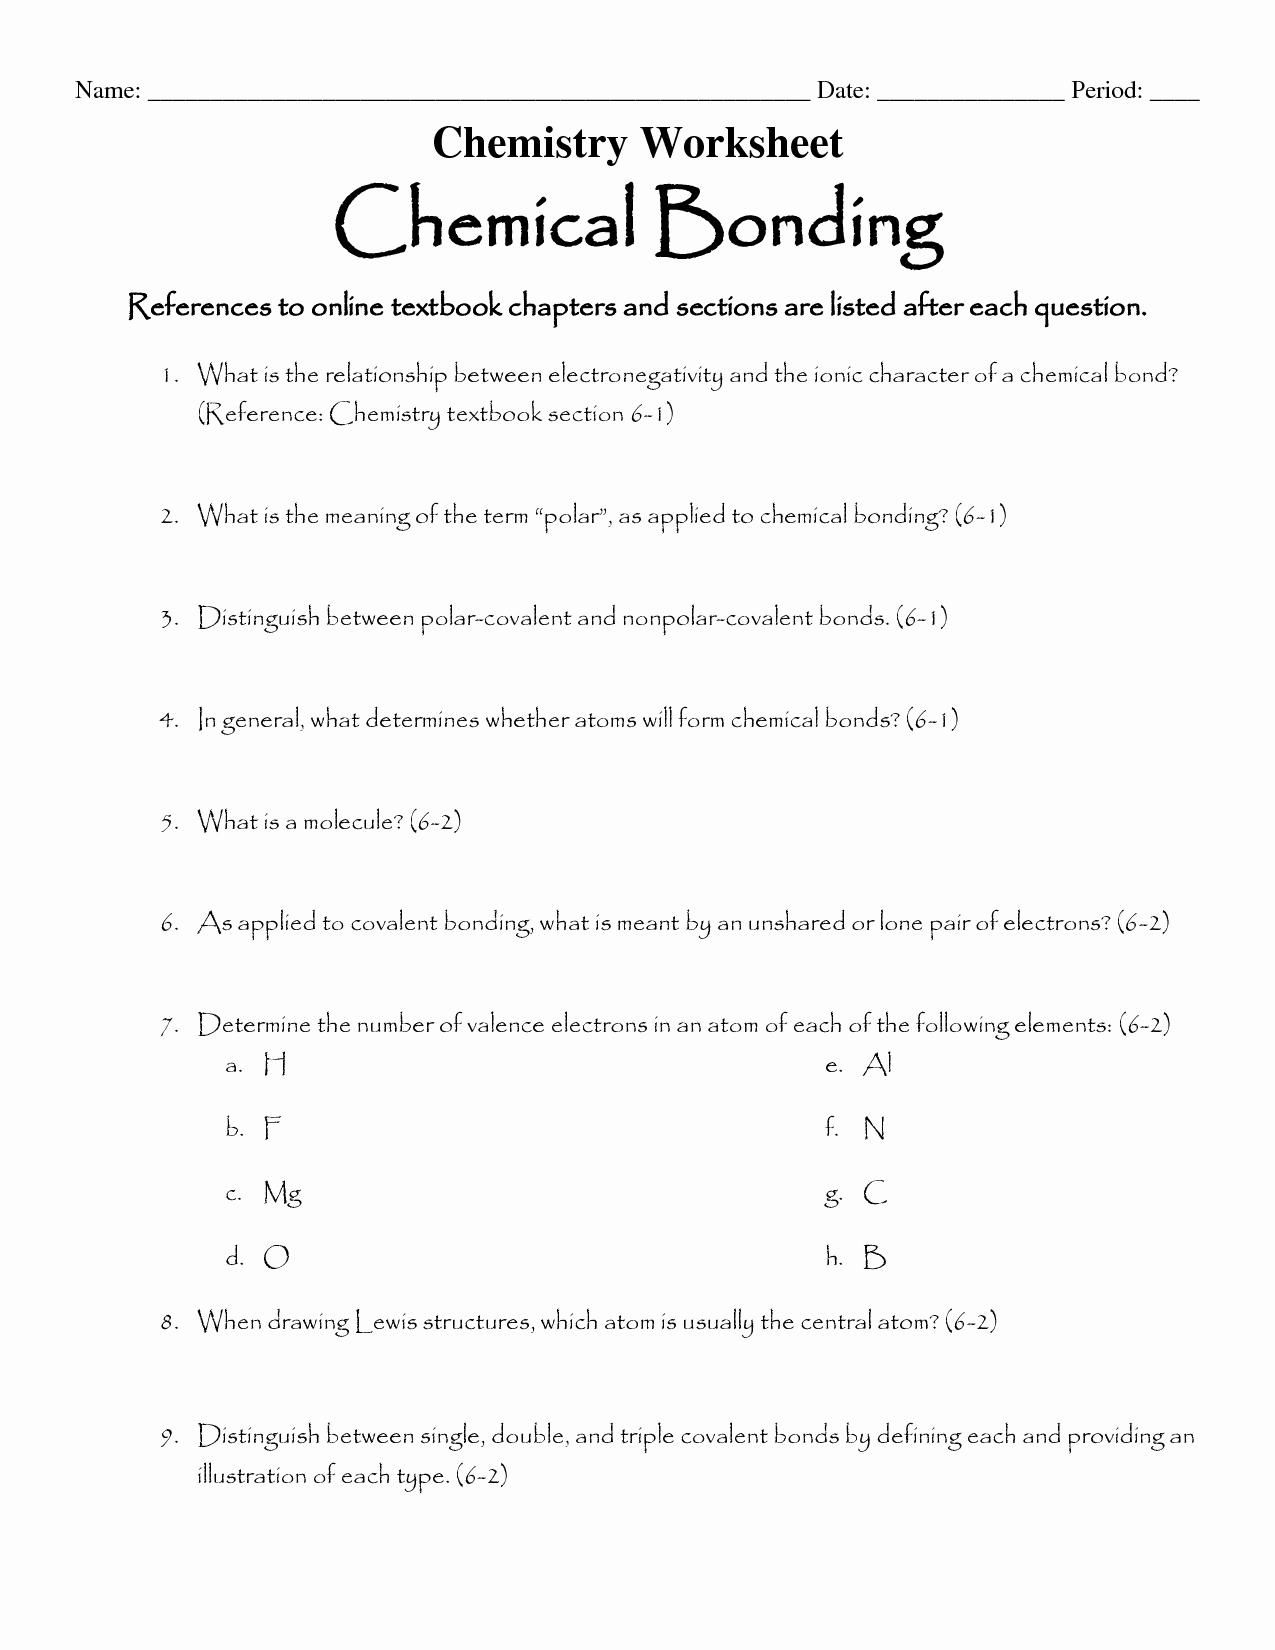 Covalent Bonding Worksheet Answer Key Unique 16 Best Of Types Chemical Bonds Worksheet